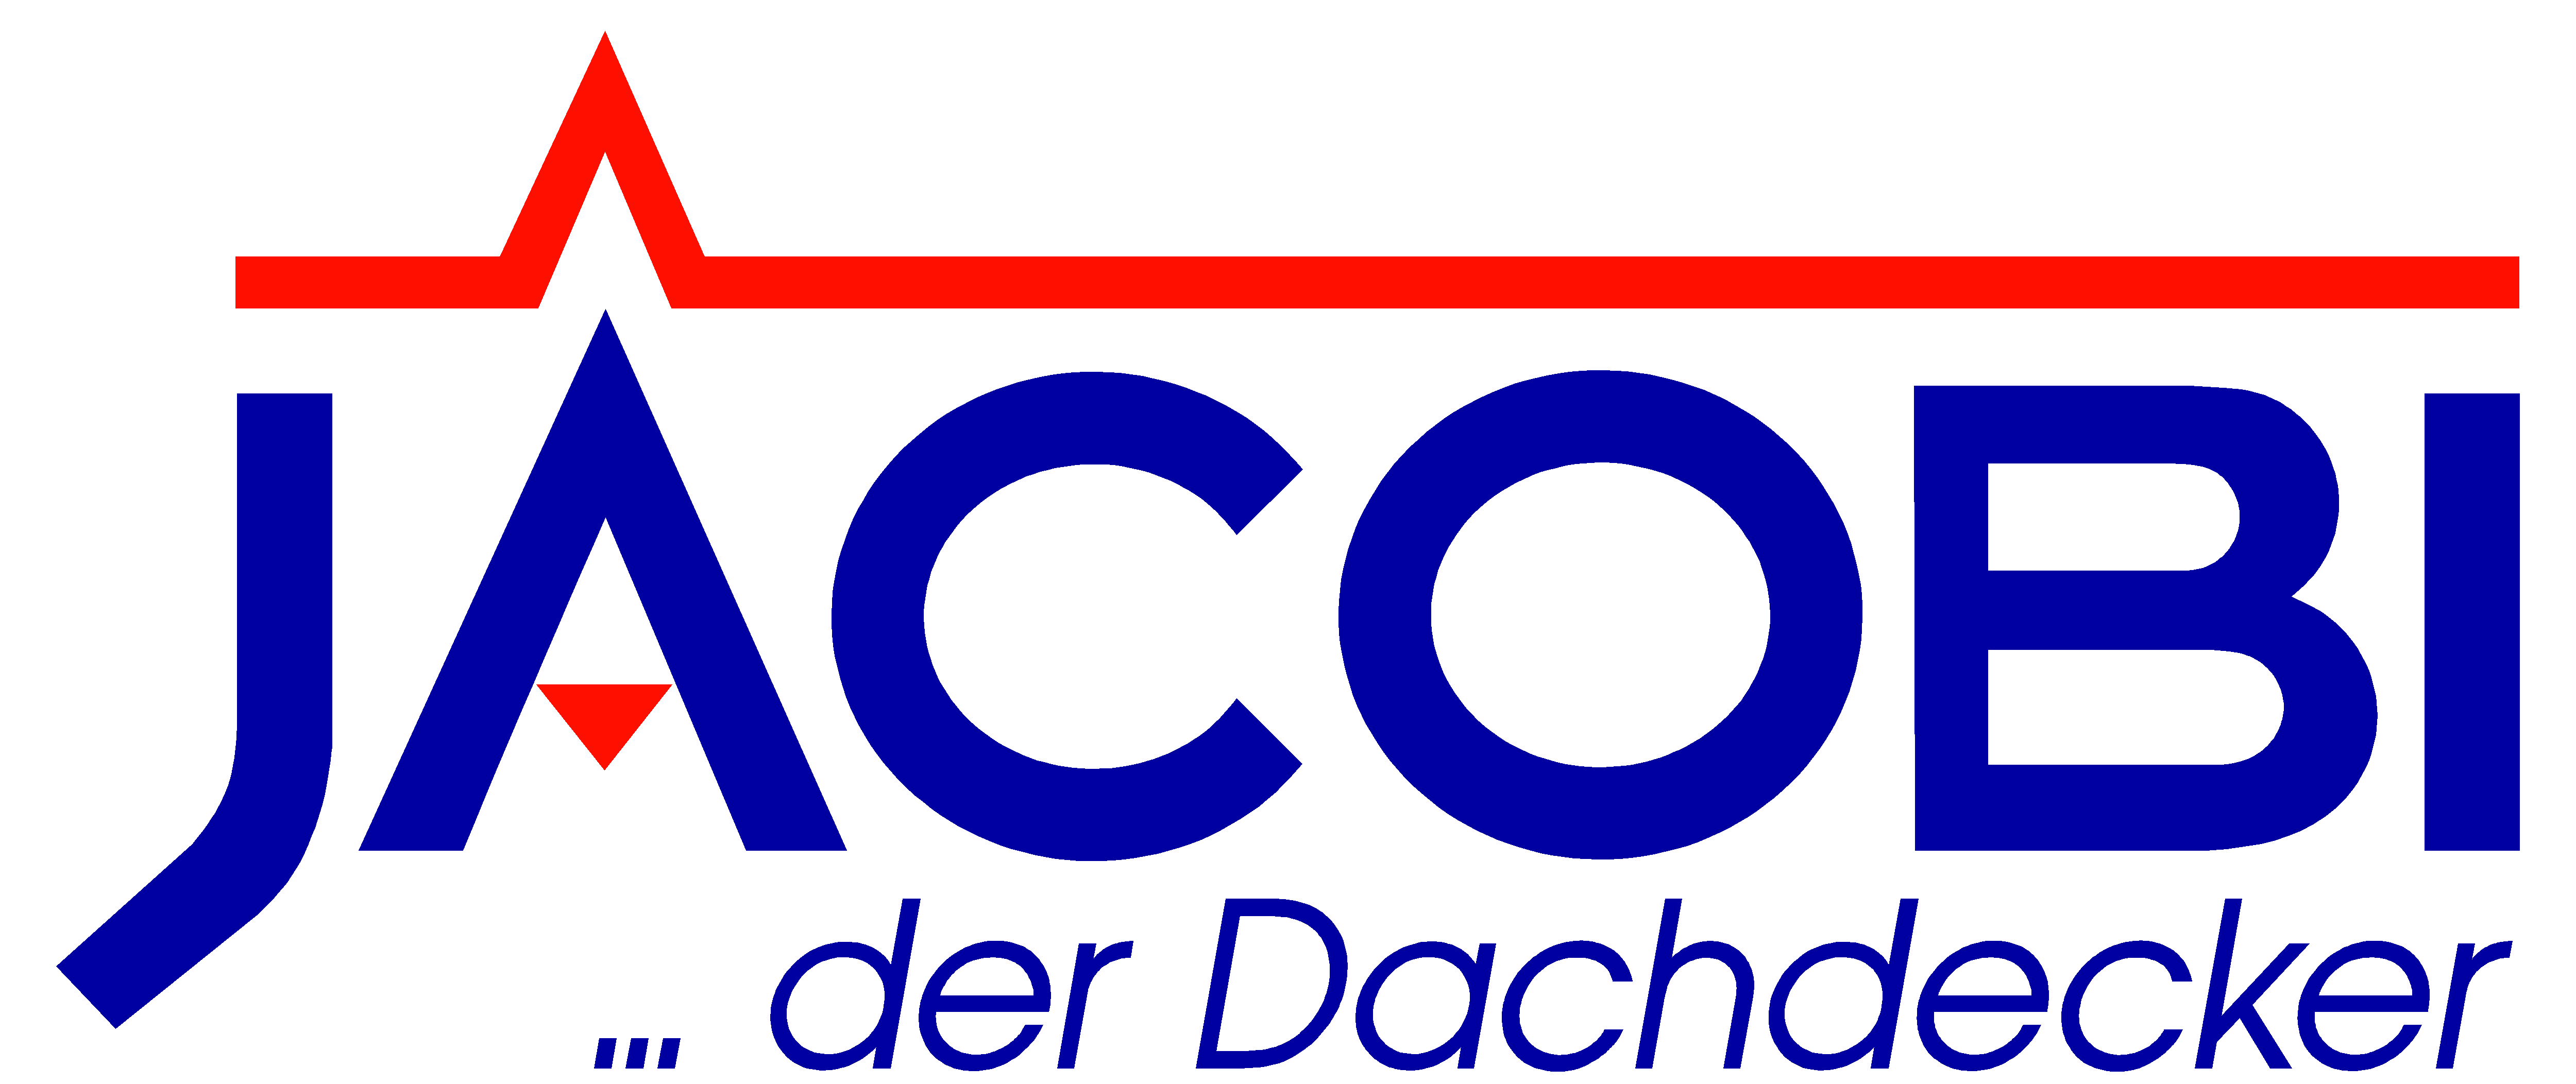 Jacobi der Dachdecker-Logo JPEG